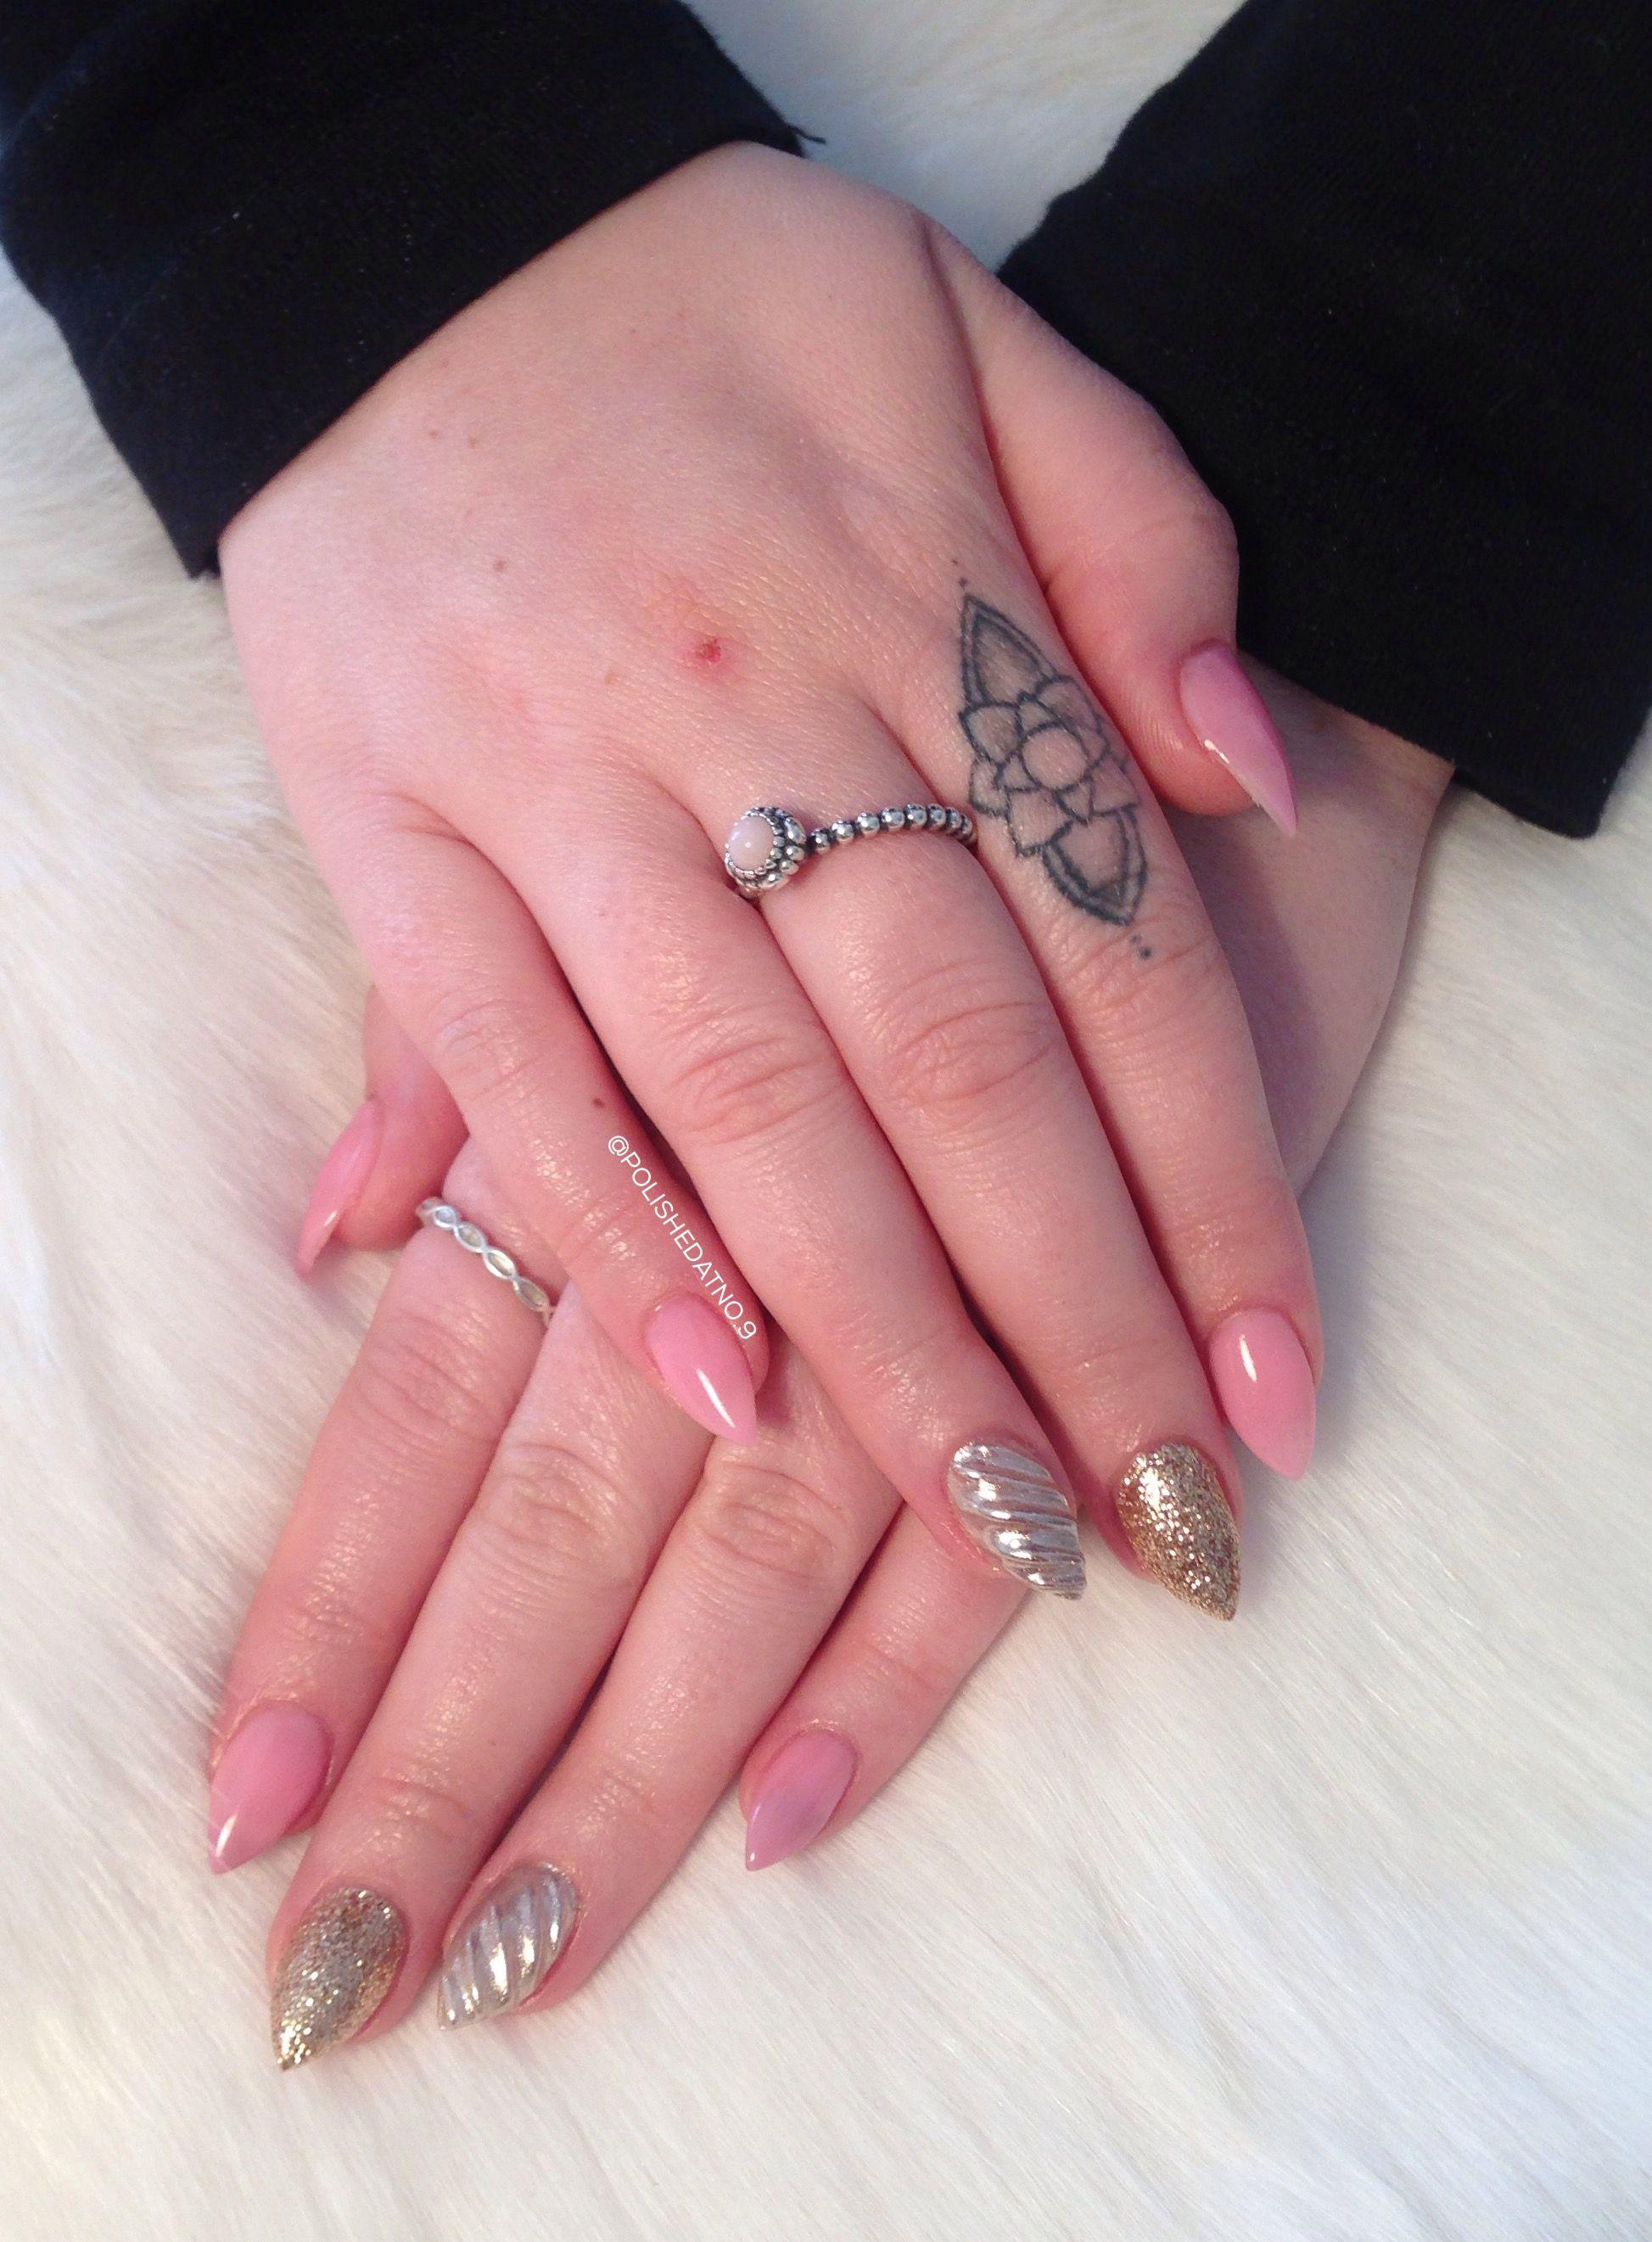 ✨ Acrylic nails with chrome unicorn horn, gold glitter light ...